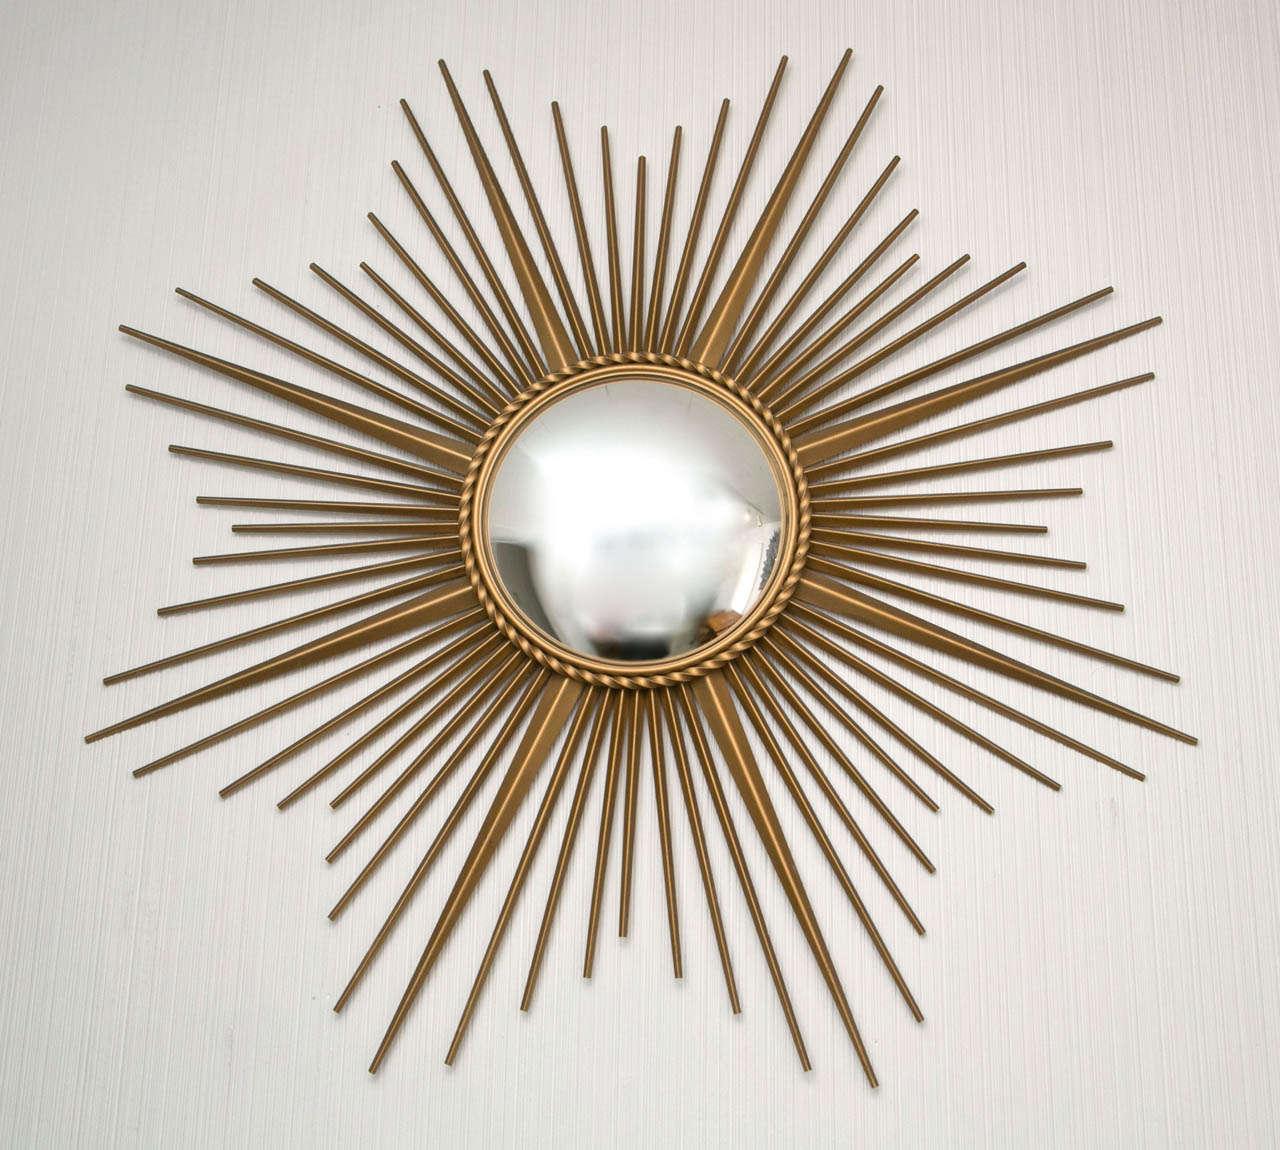 Gilt metal chaty vallauris mirror at 1stdibs for Chaty vallauris miroir